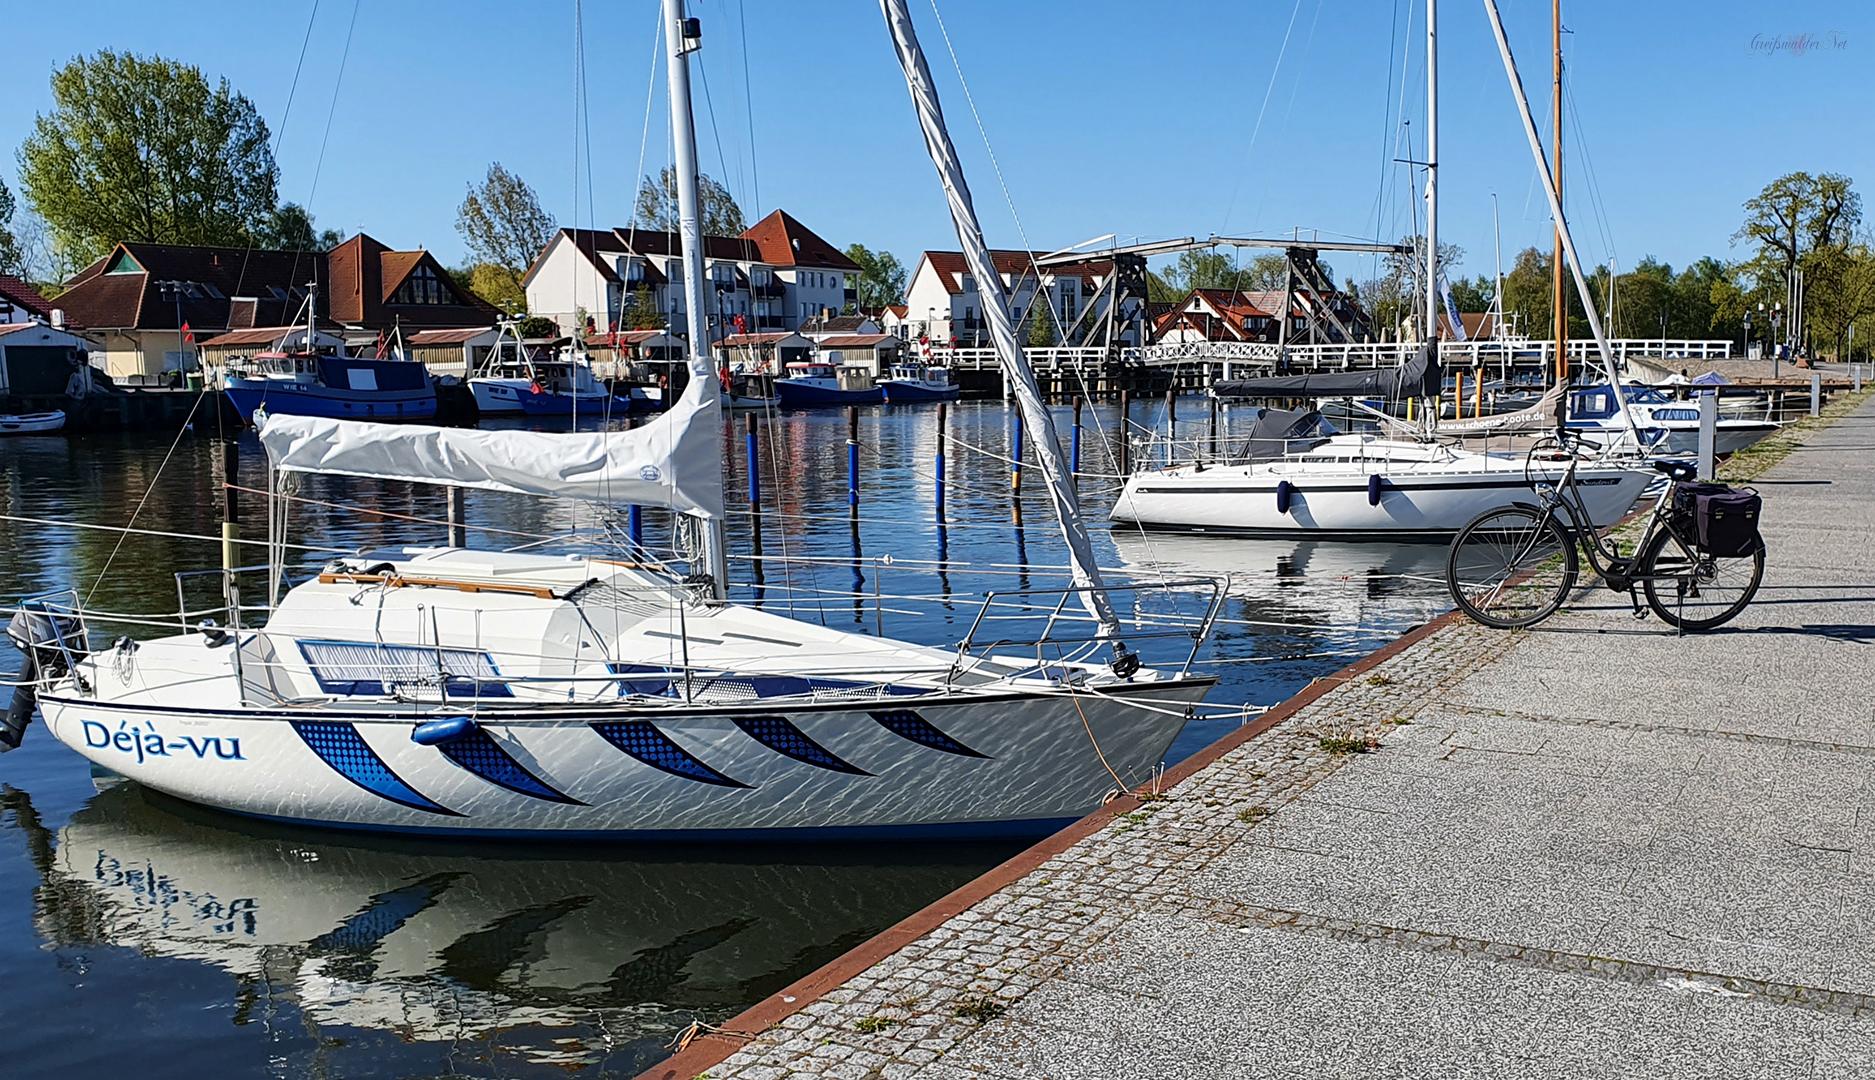 Déjà-vu - Frühling in Greifswald-Wieck